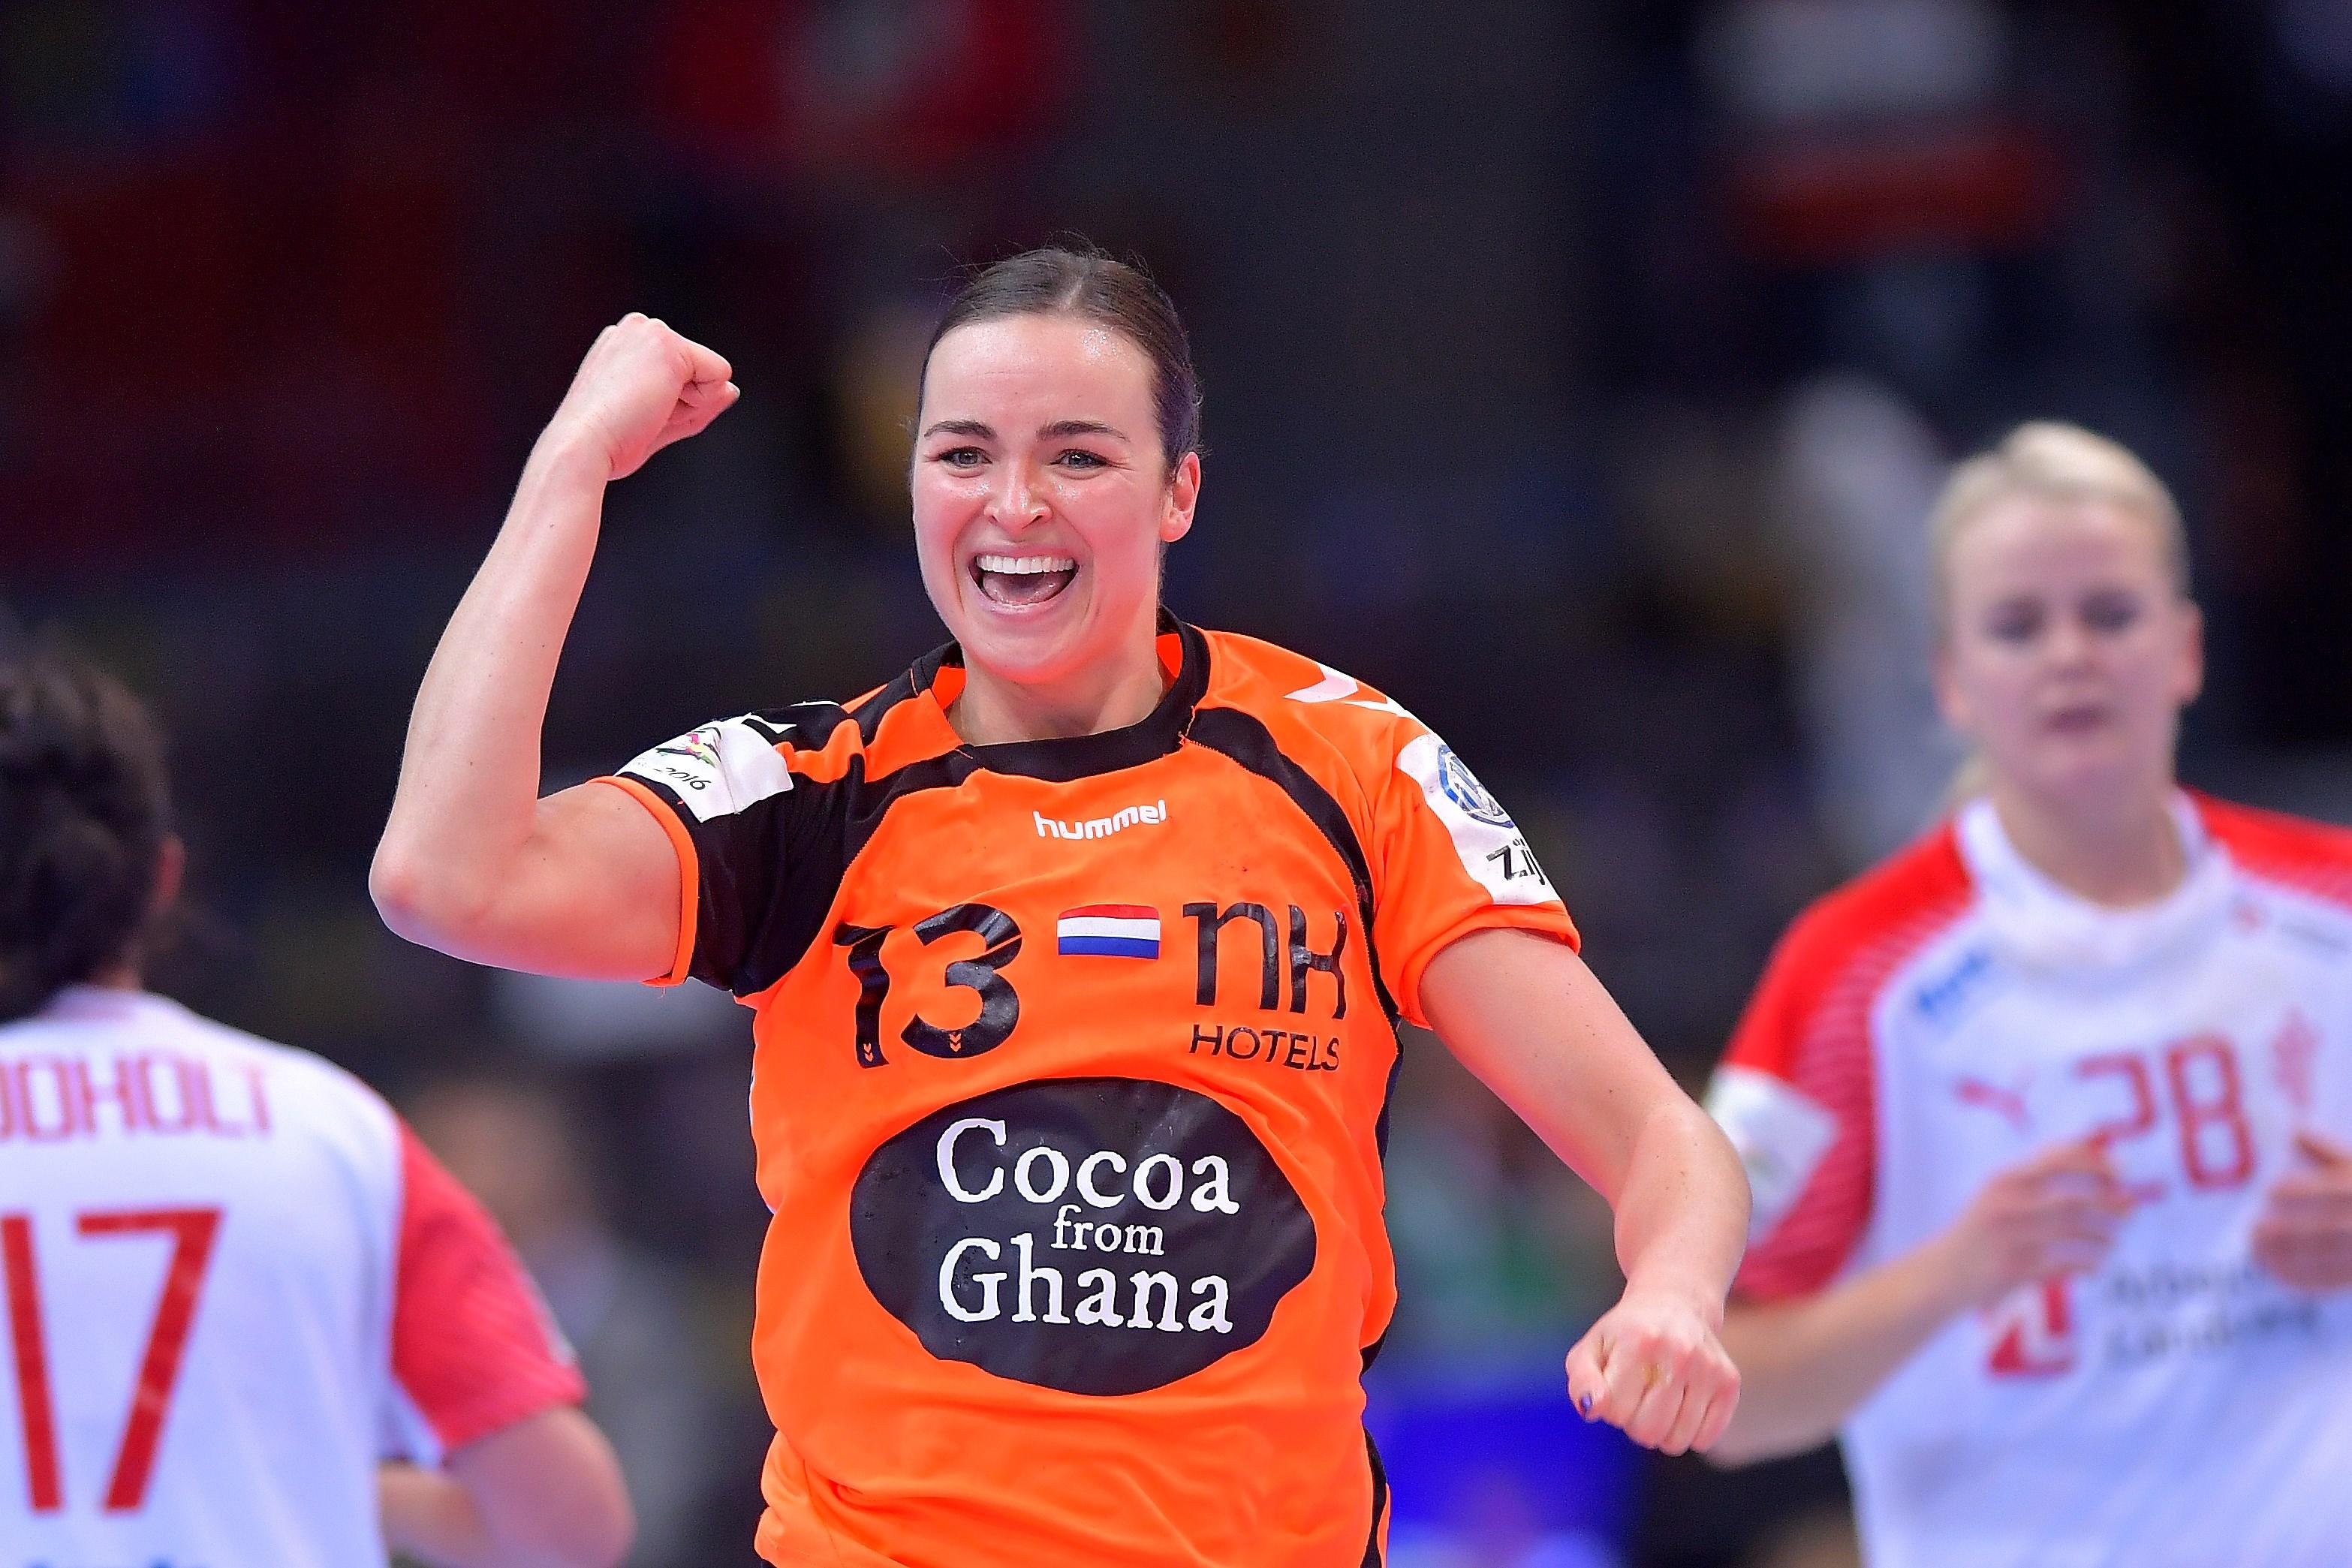 De comeback van handbalster Yvette Broch